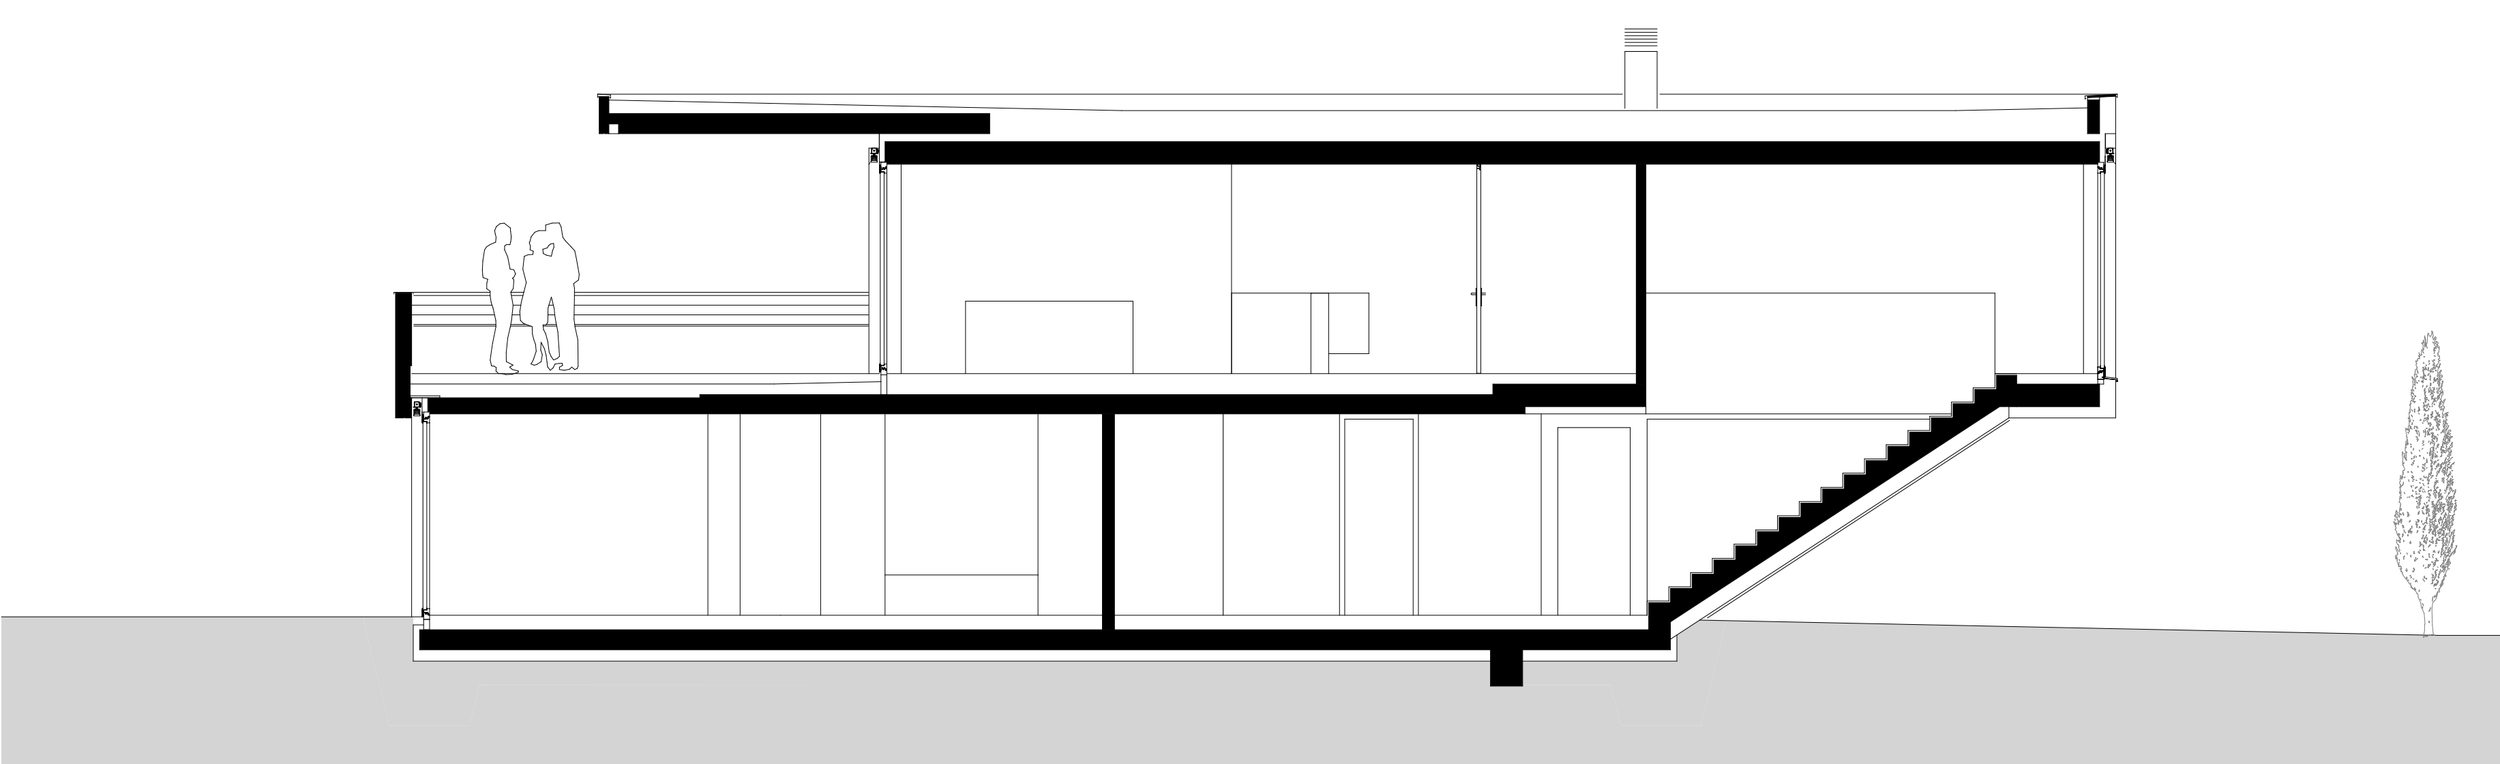 Haus Depaoli Schnitt